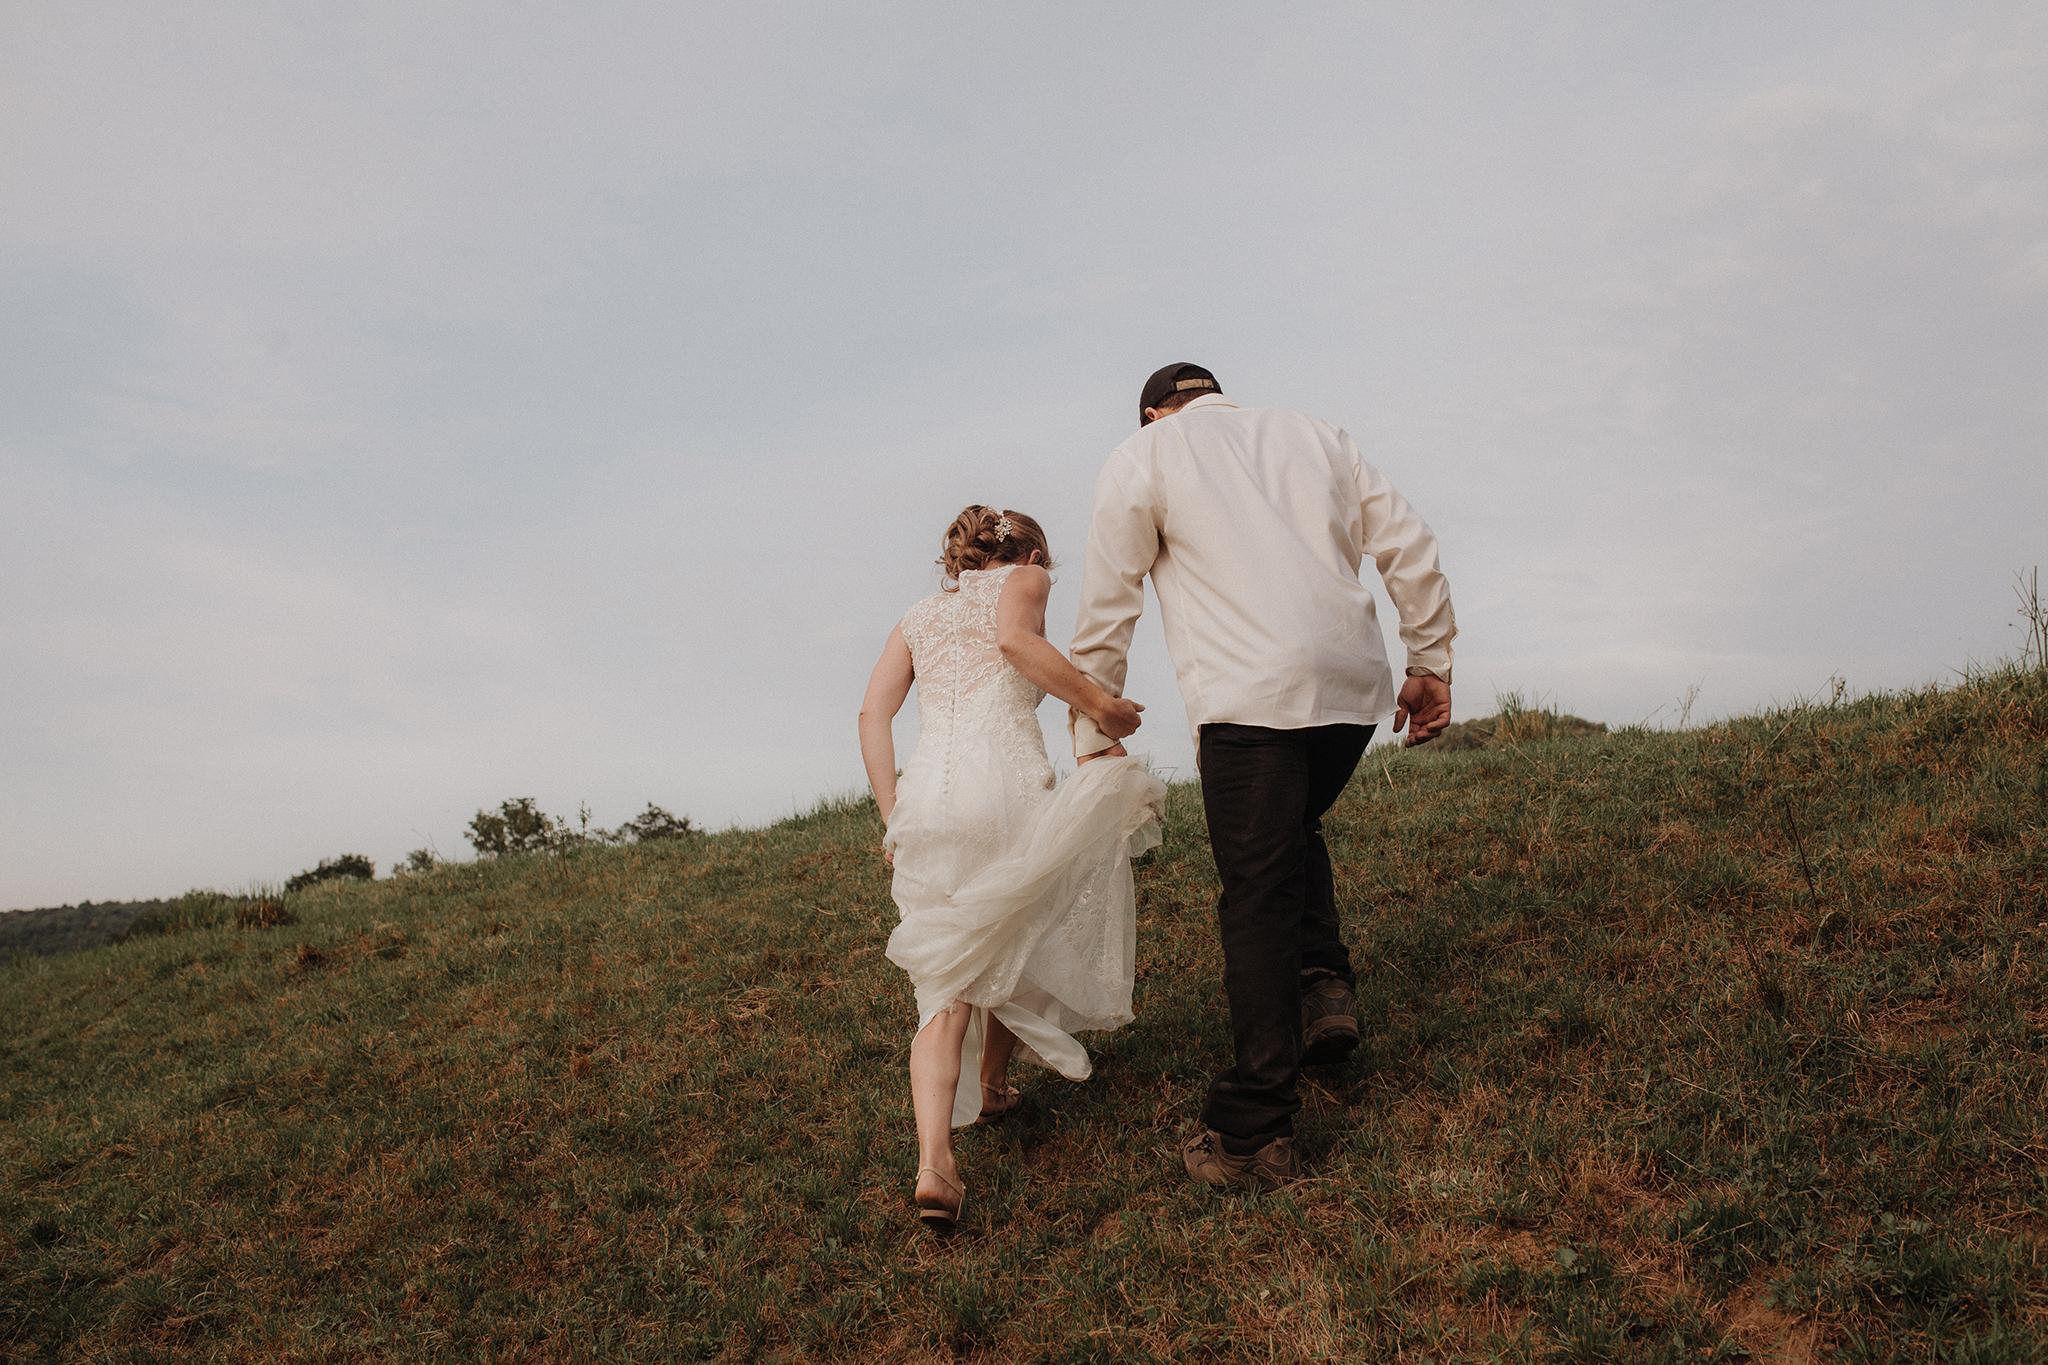 vermont-wedding-photographer-outdoor-farm-wedding-60.jpg